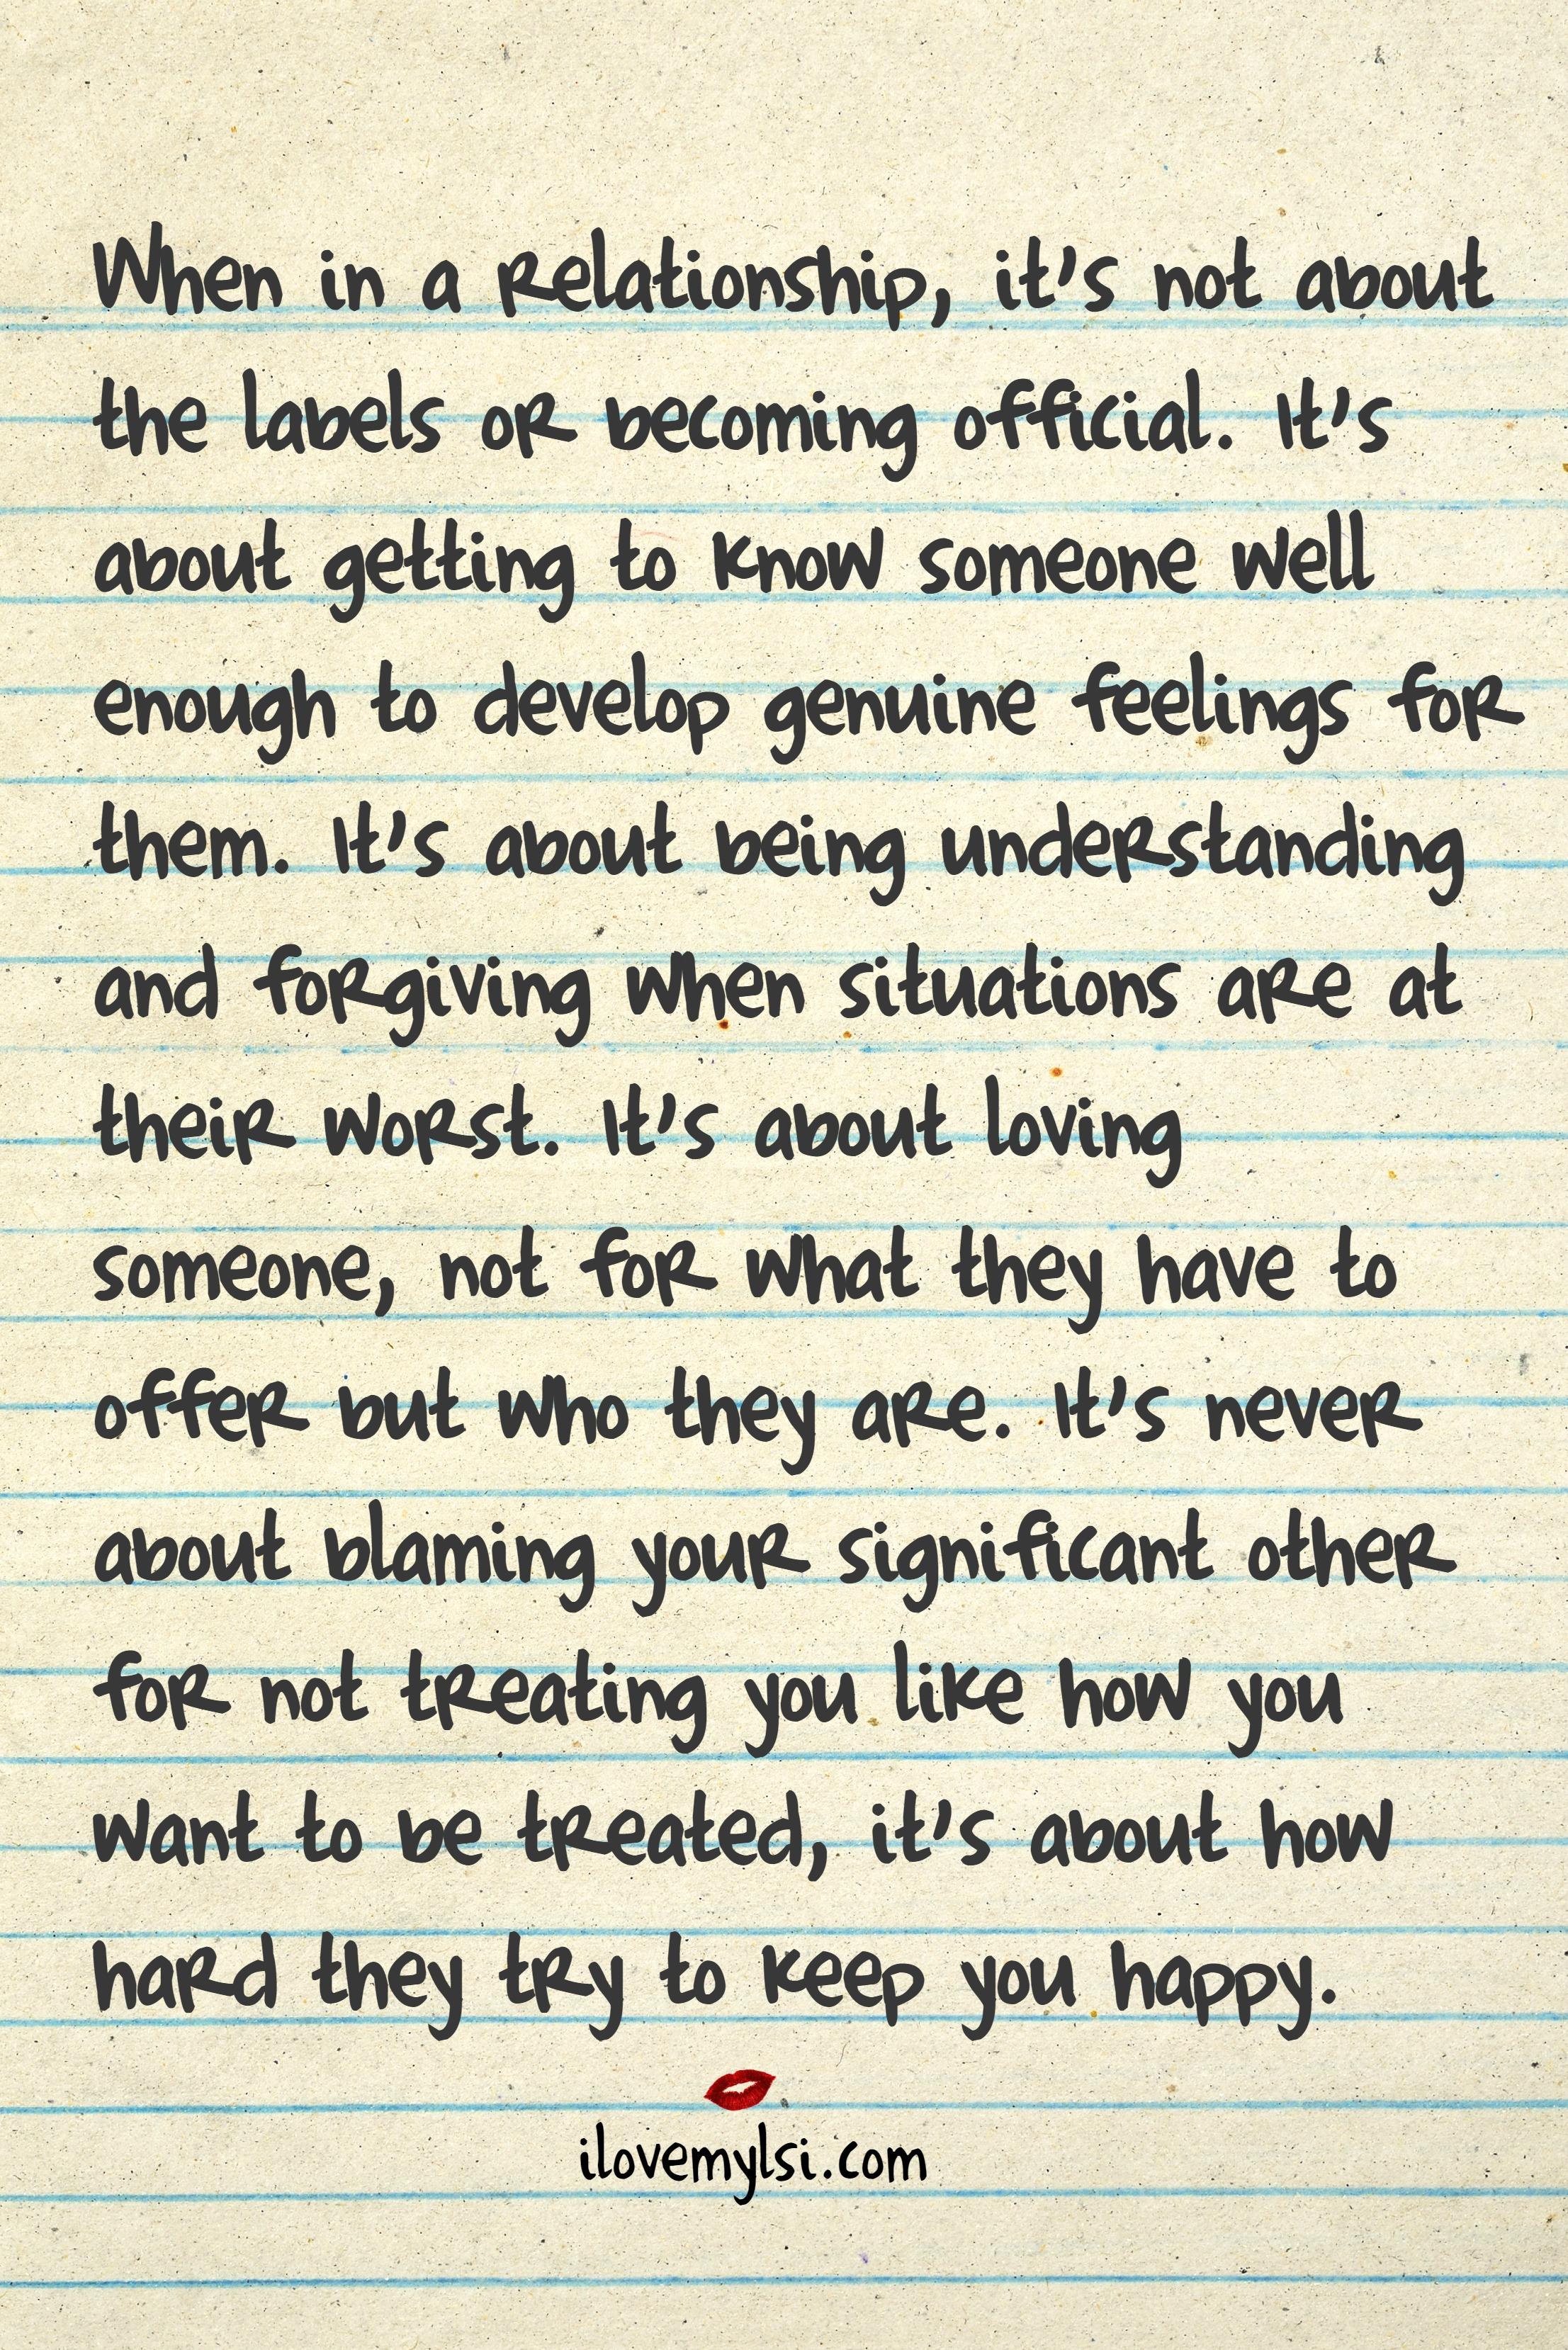 reverse psychology love relationship